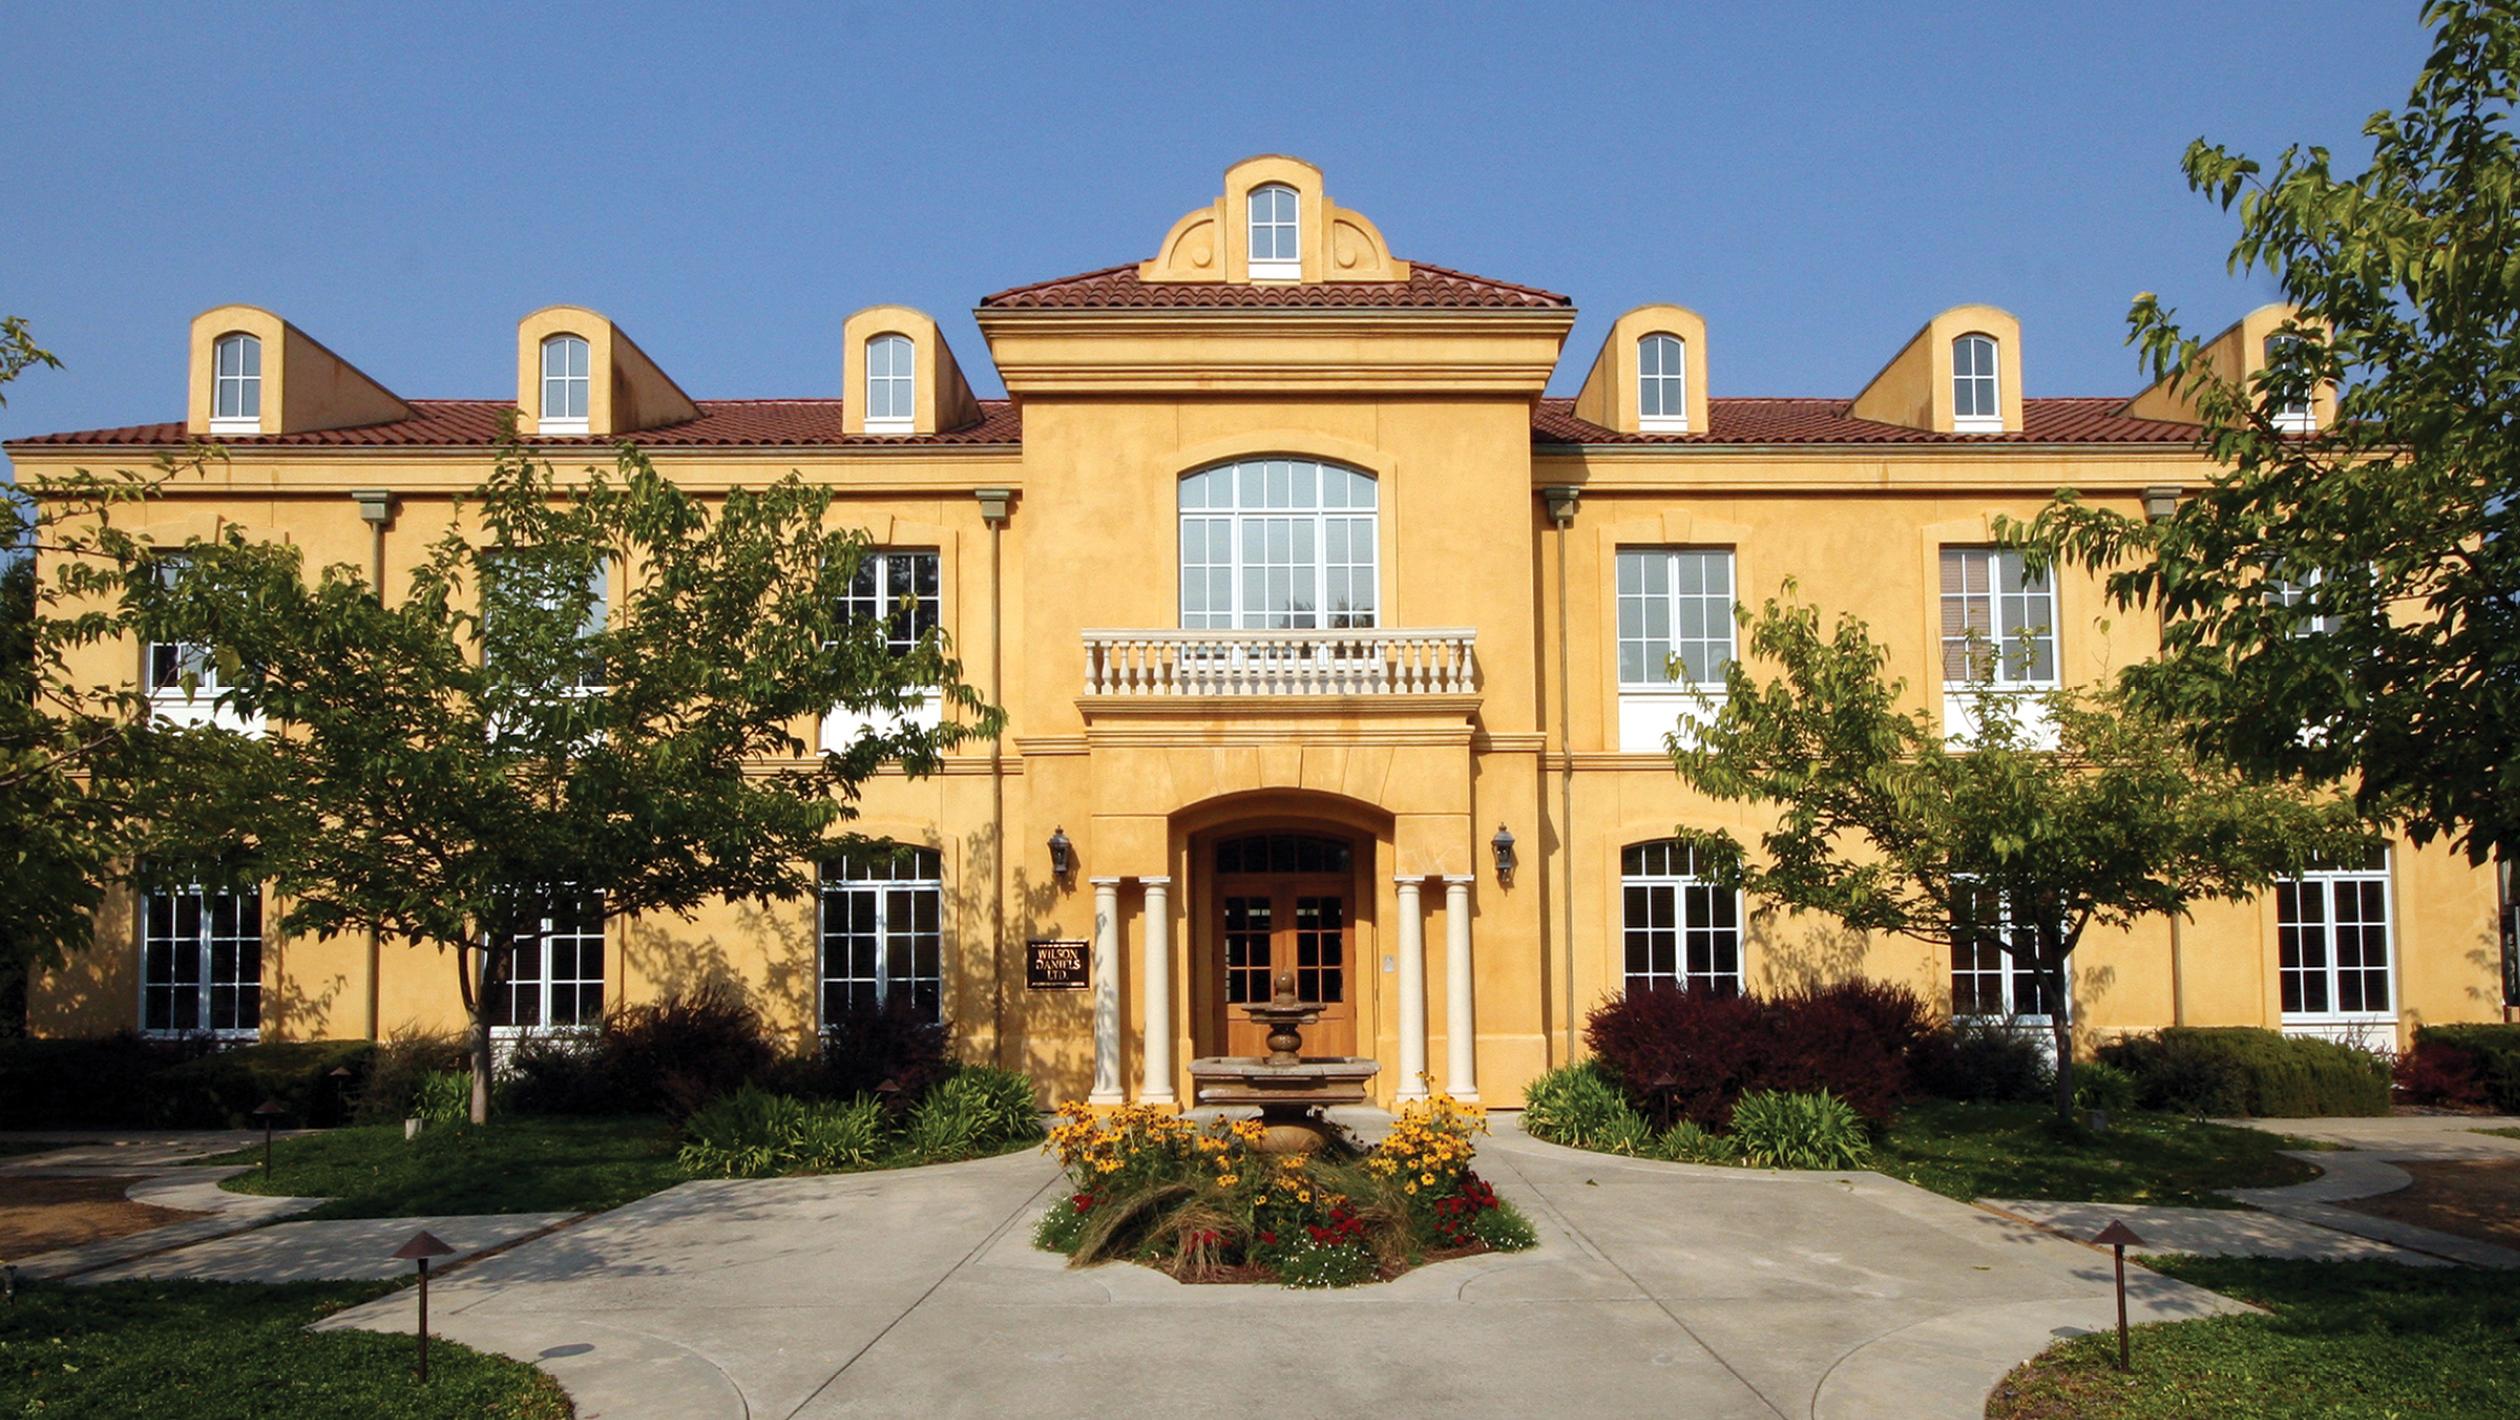 Wilson Daniels Headquarters In Napa California Photo Courtesy Of